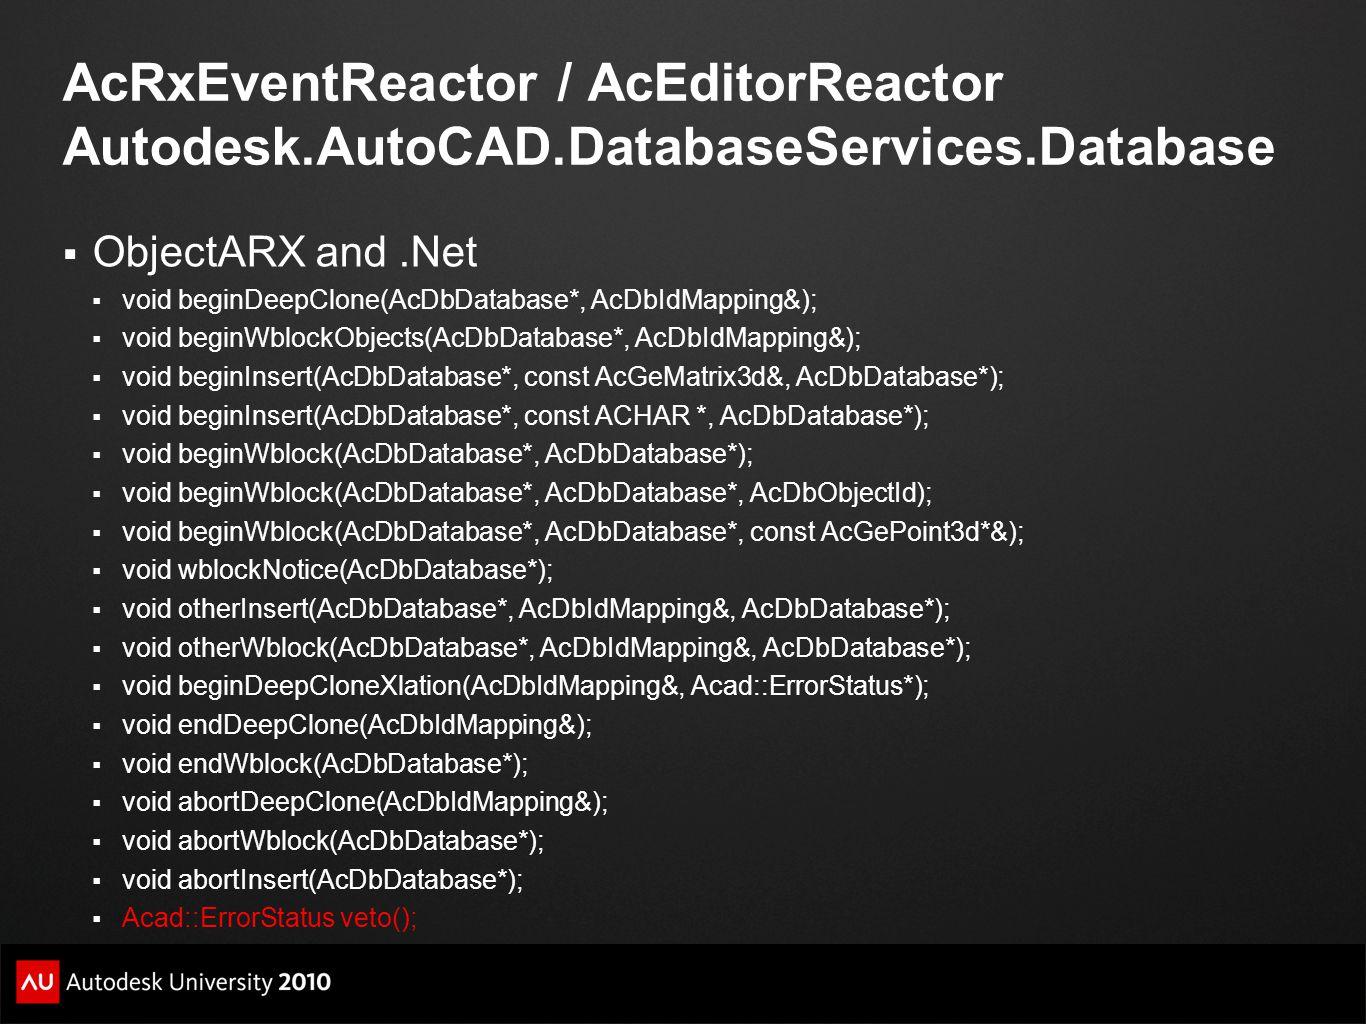 AcRxEventReactor / AcEditorReactor Autodesk.AutoCAD.DatabaseServices.Database  ObjectARX and.Net  void beginDeepClone(AcDbDatabase*, AcDbIdMapping&)